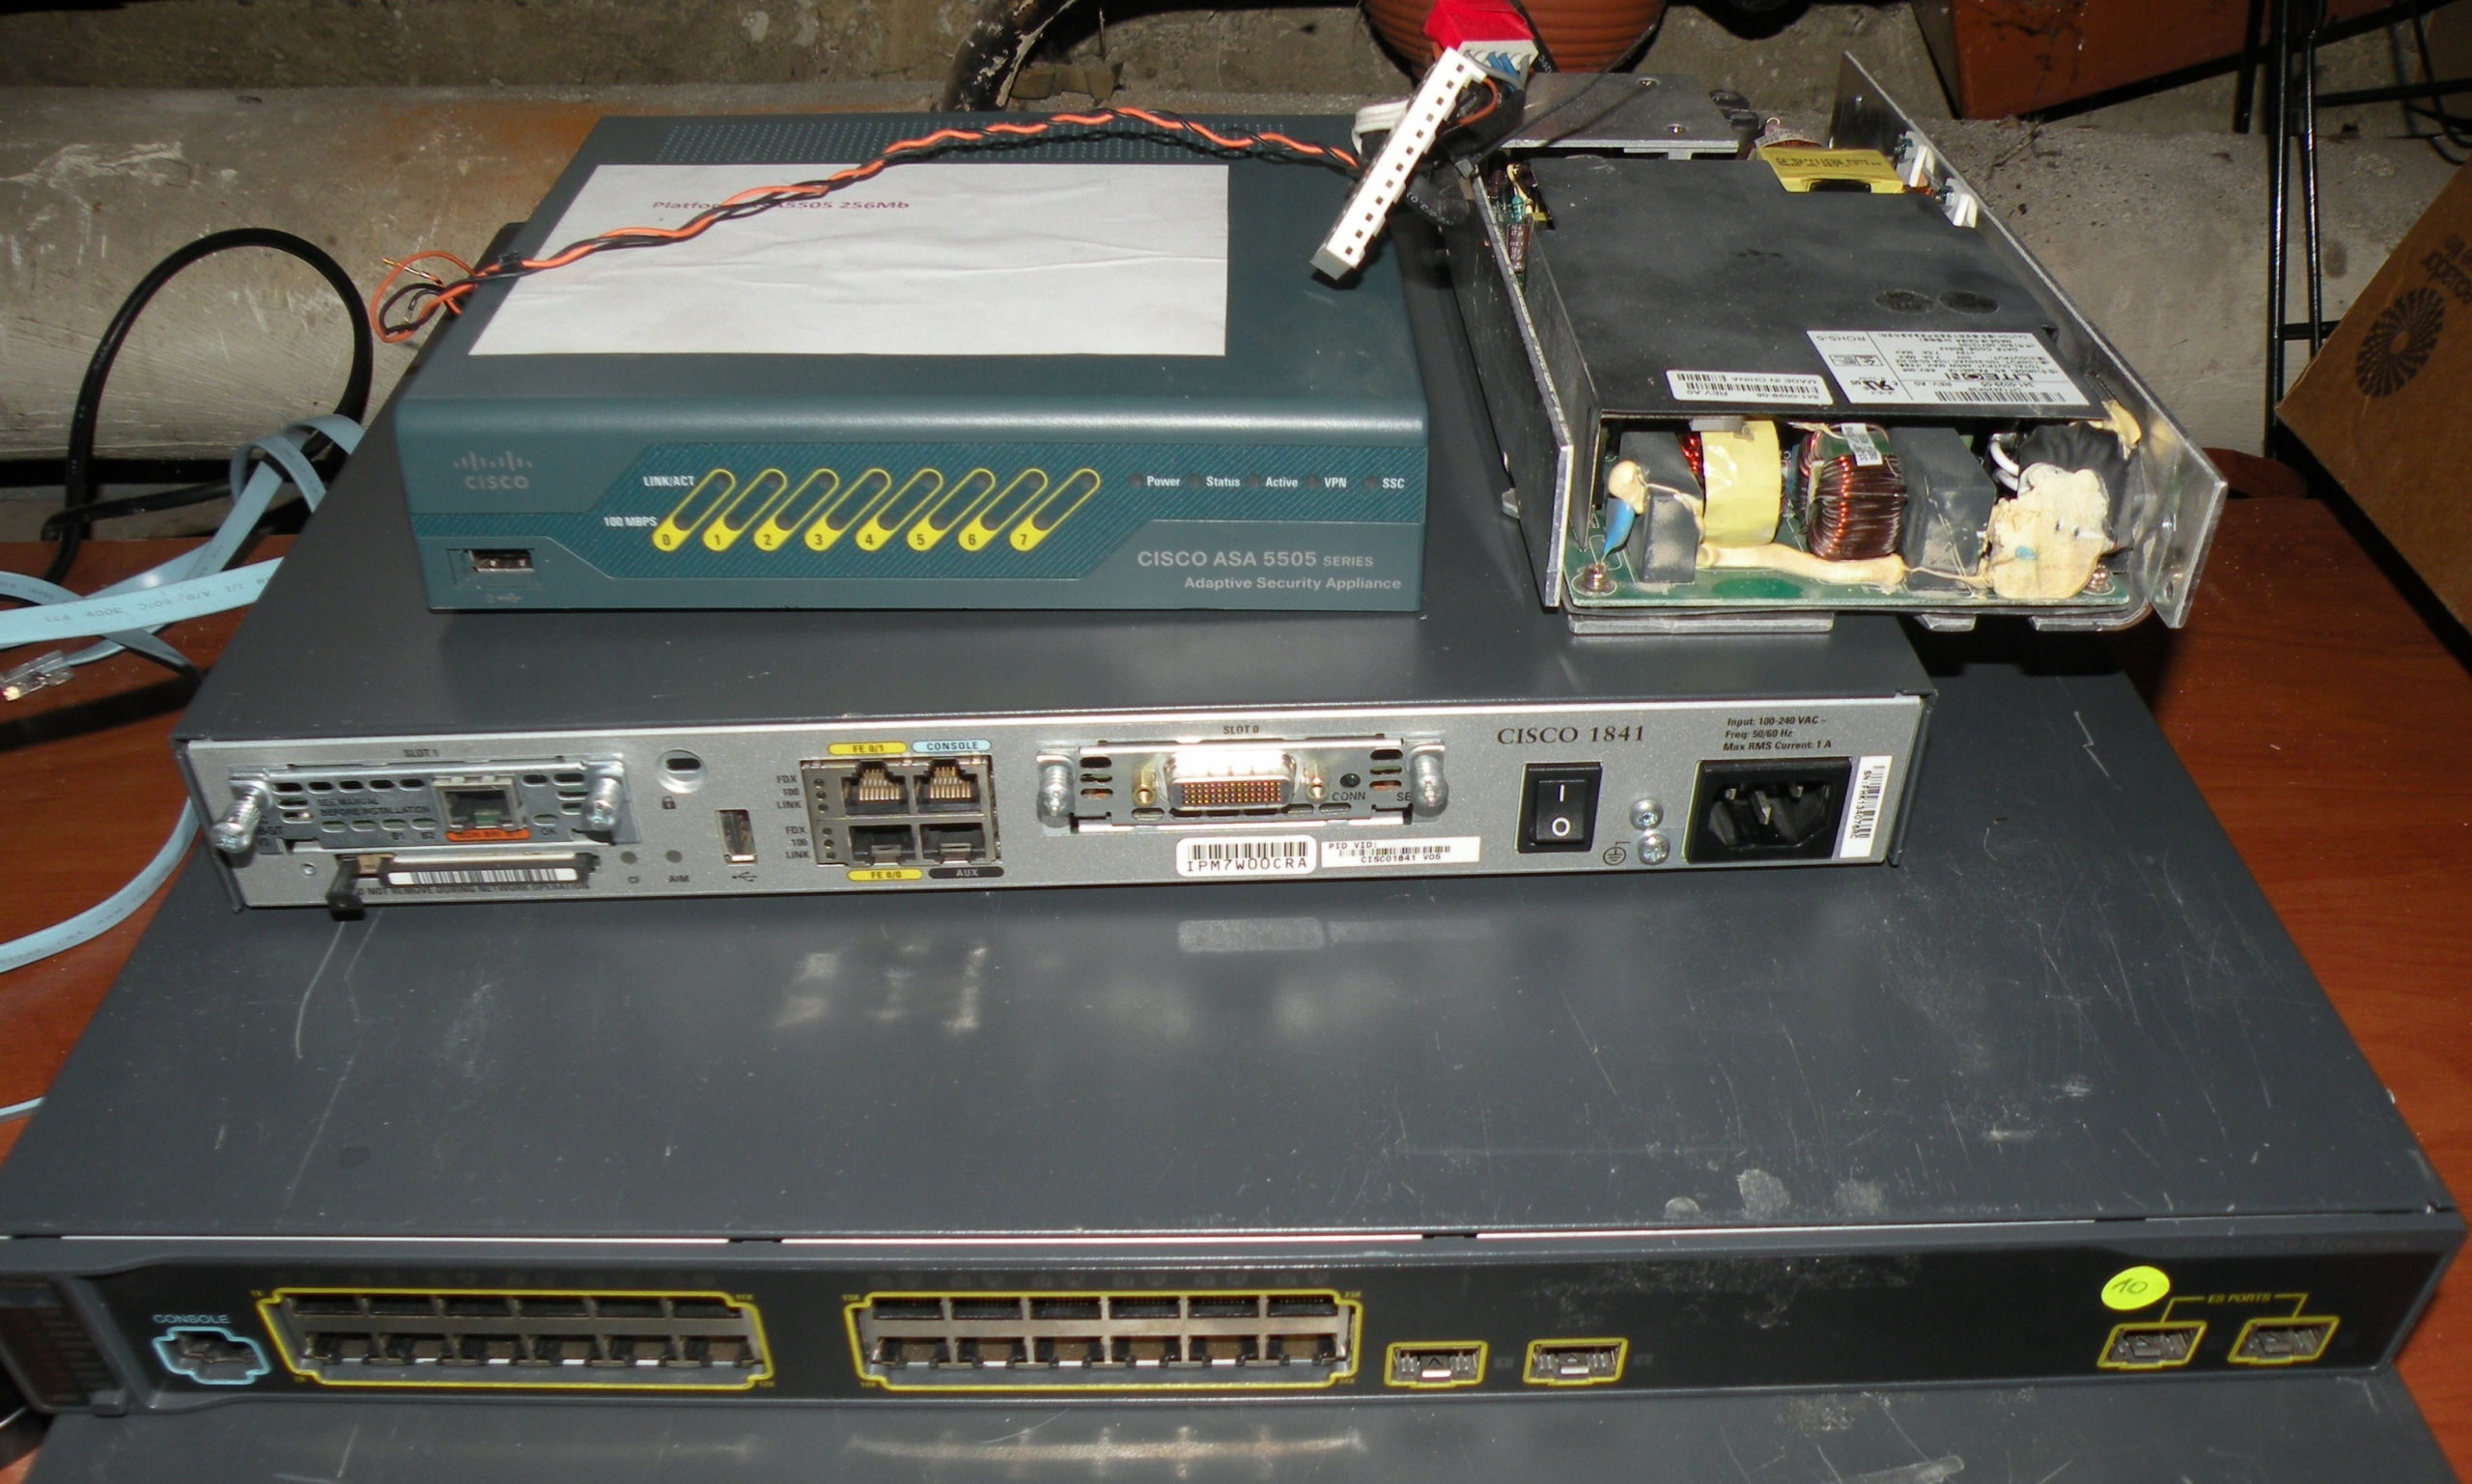 Lab CCNA,CCNP,CCIE CISCO - 7767111799 - oficjalne archiwum